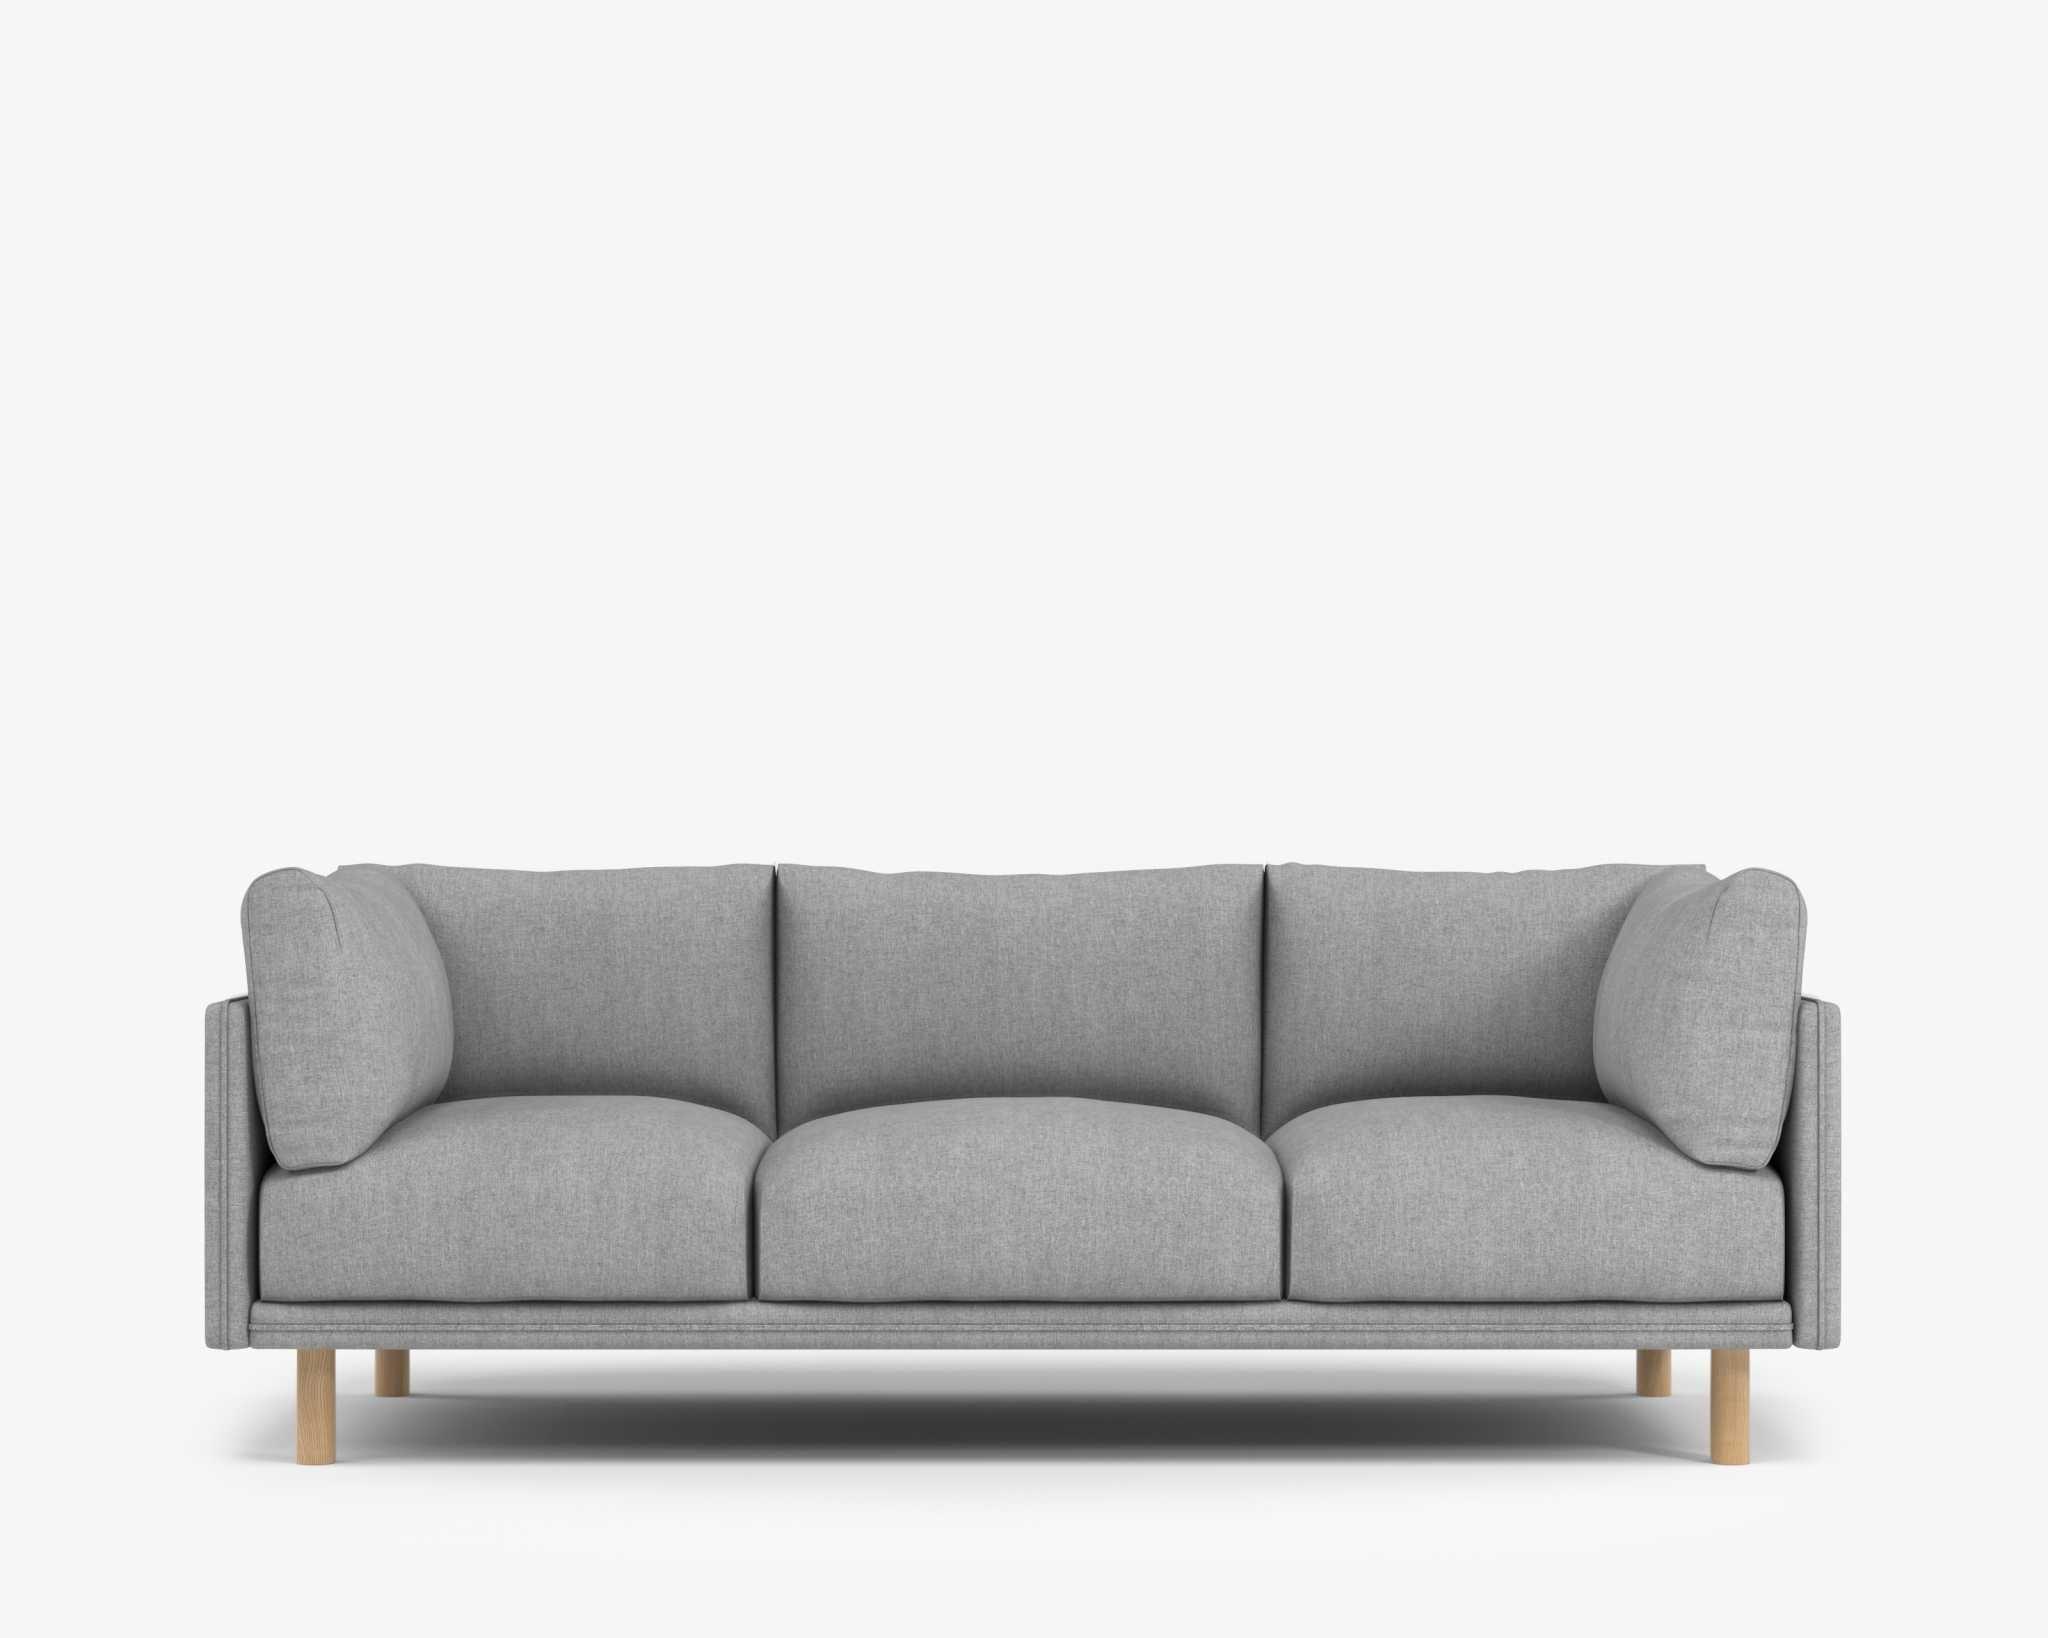 Anderson sofa modern felt malmo